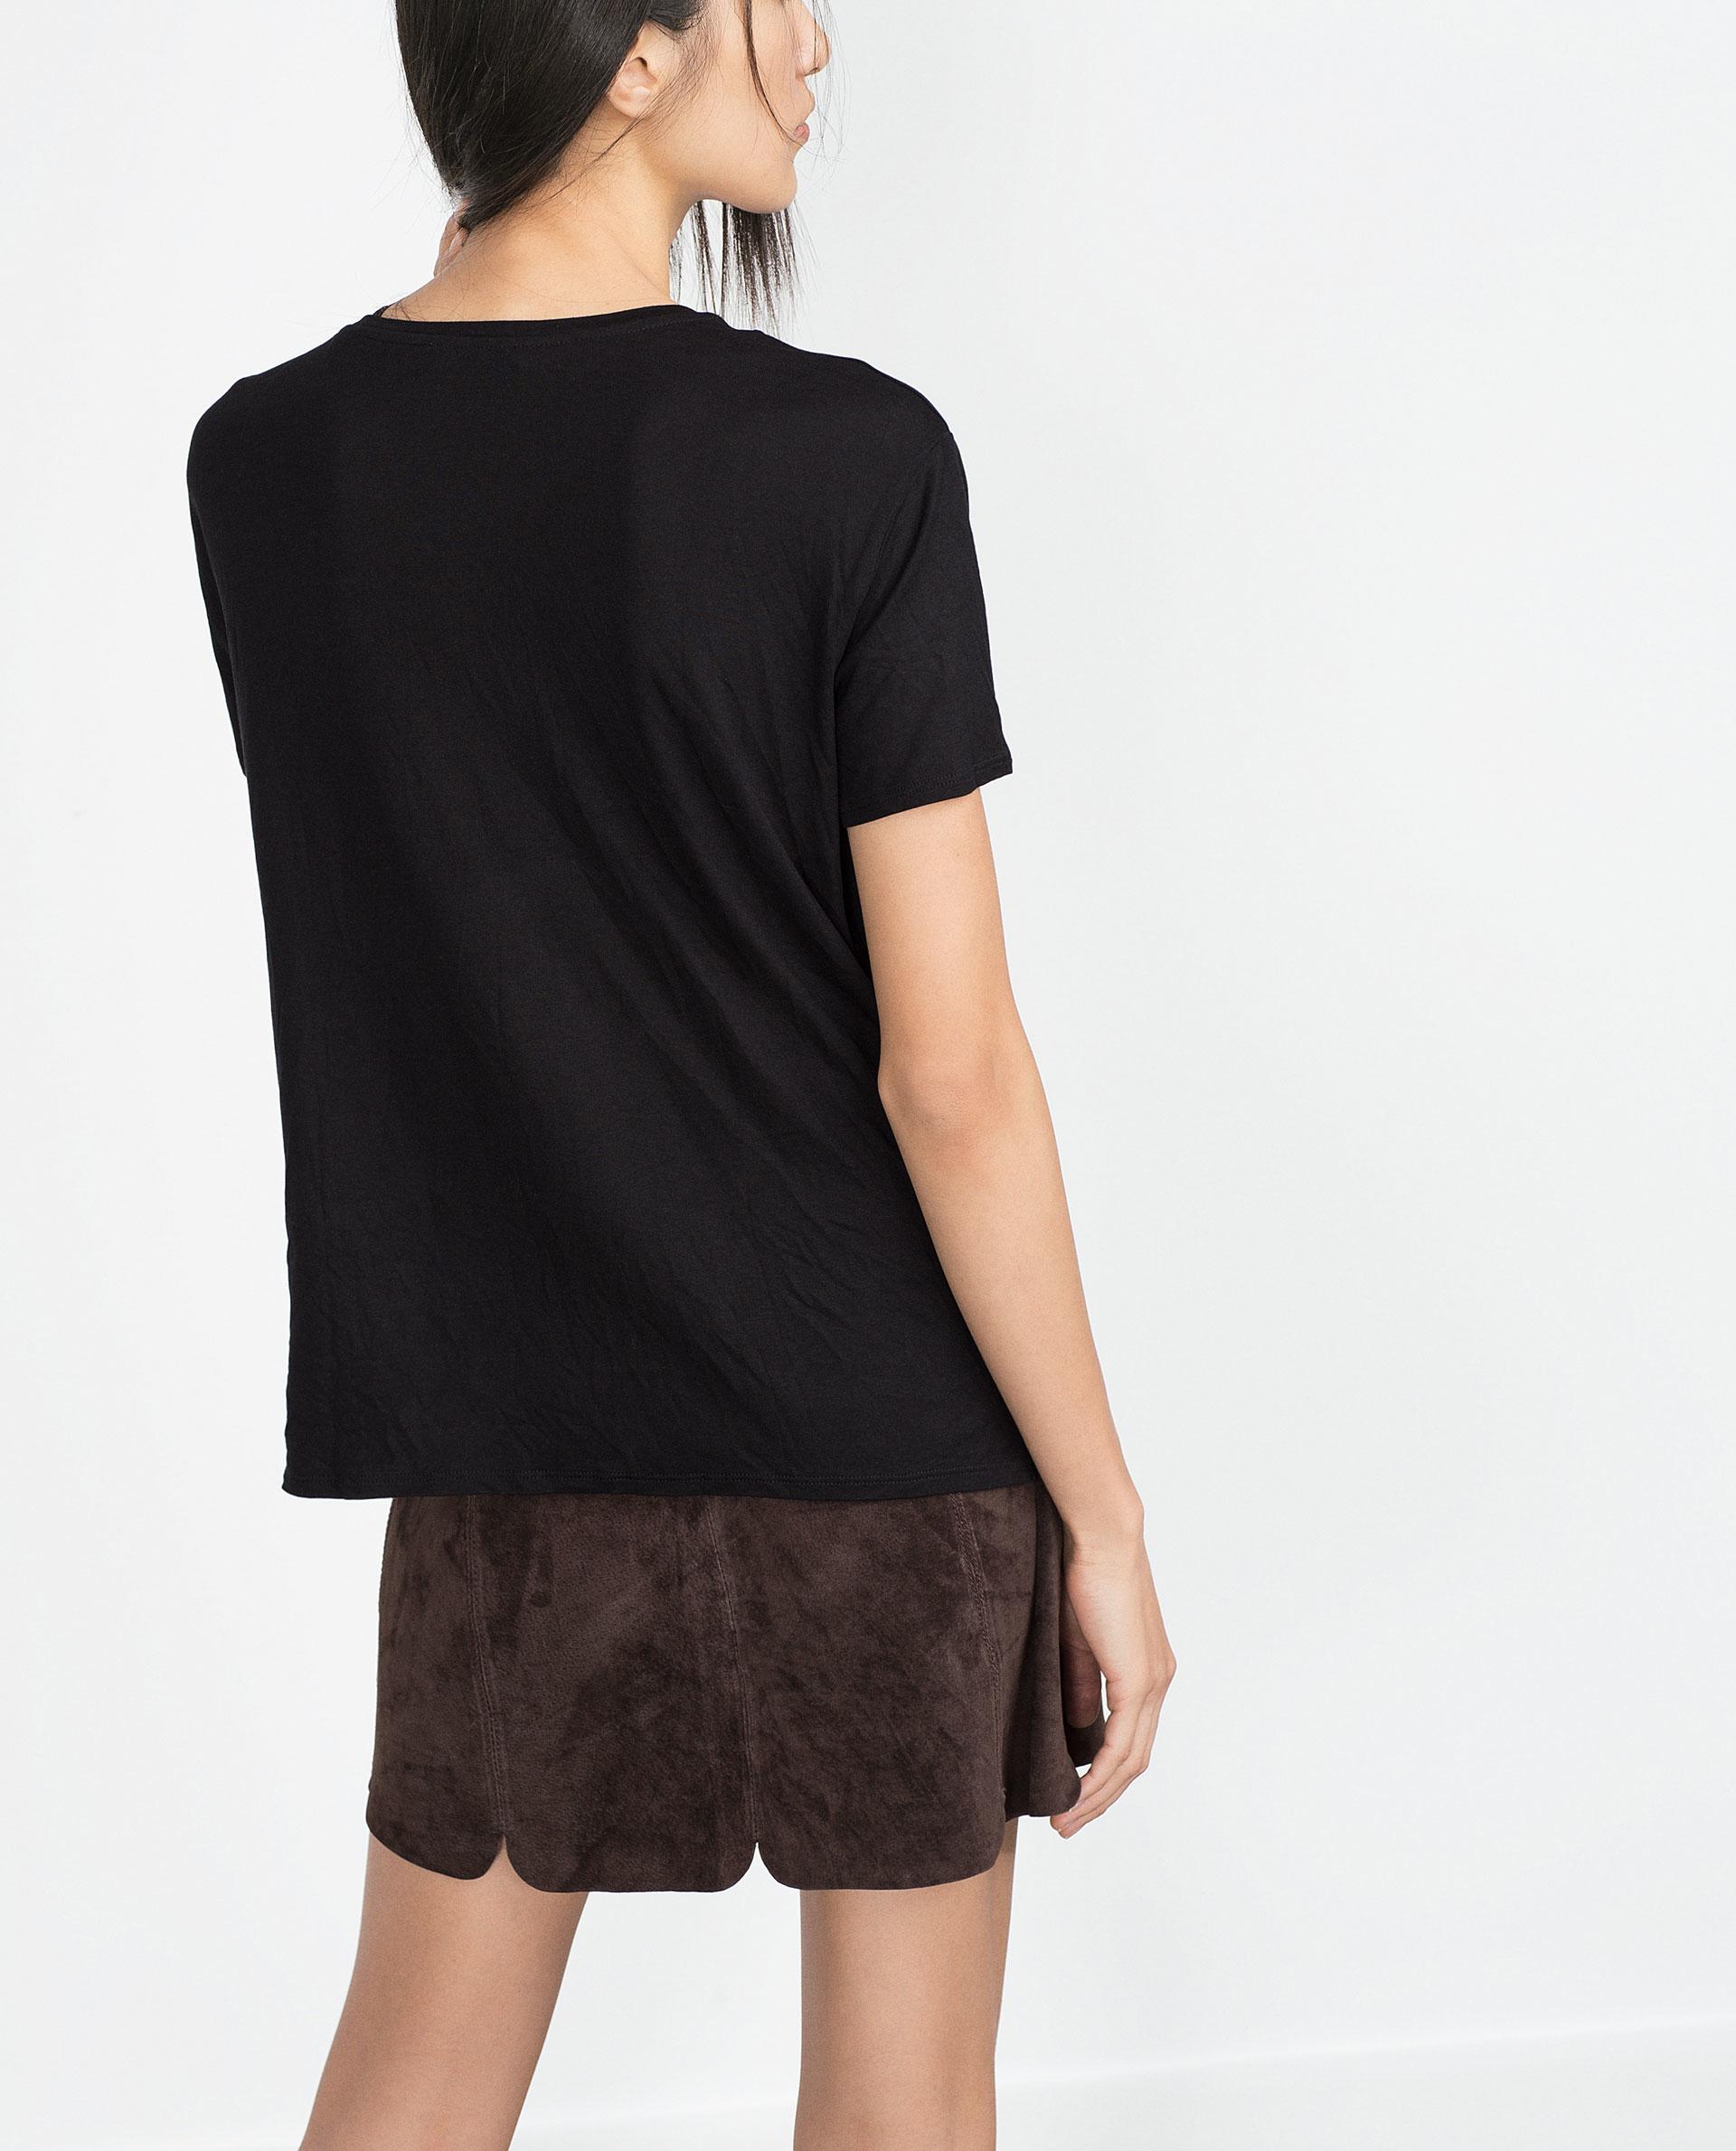 Zara patchwork t shirt in black lyst for Zara black t shirt dress